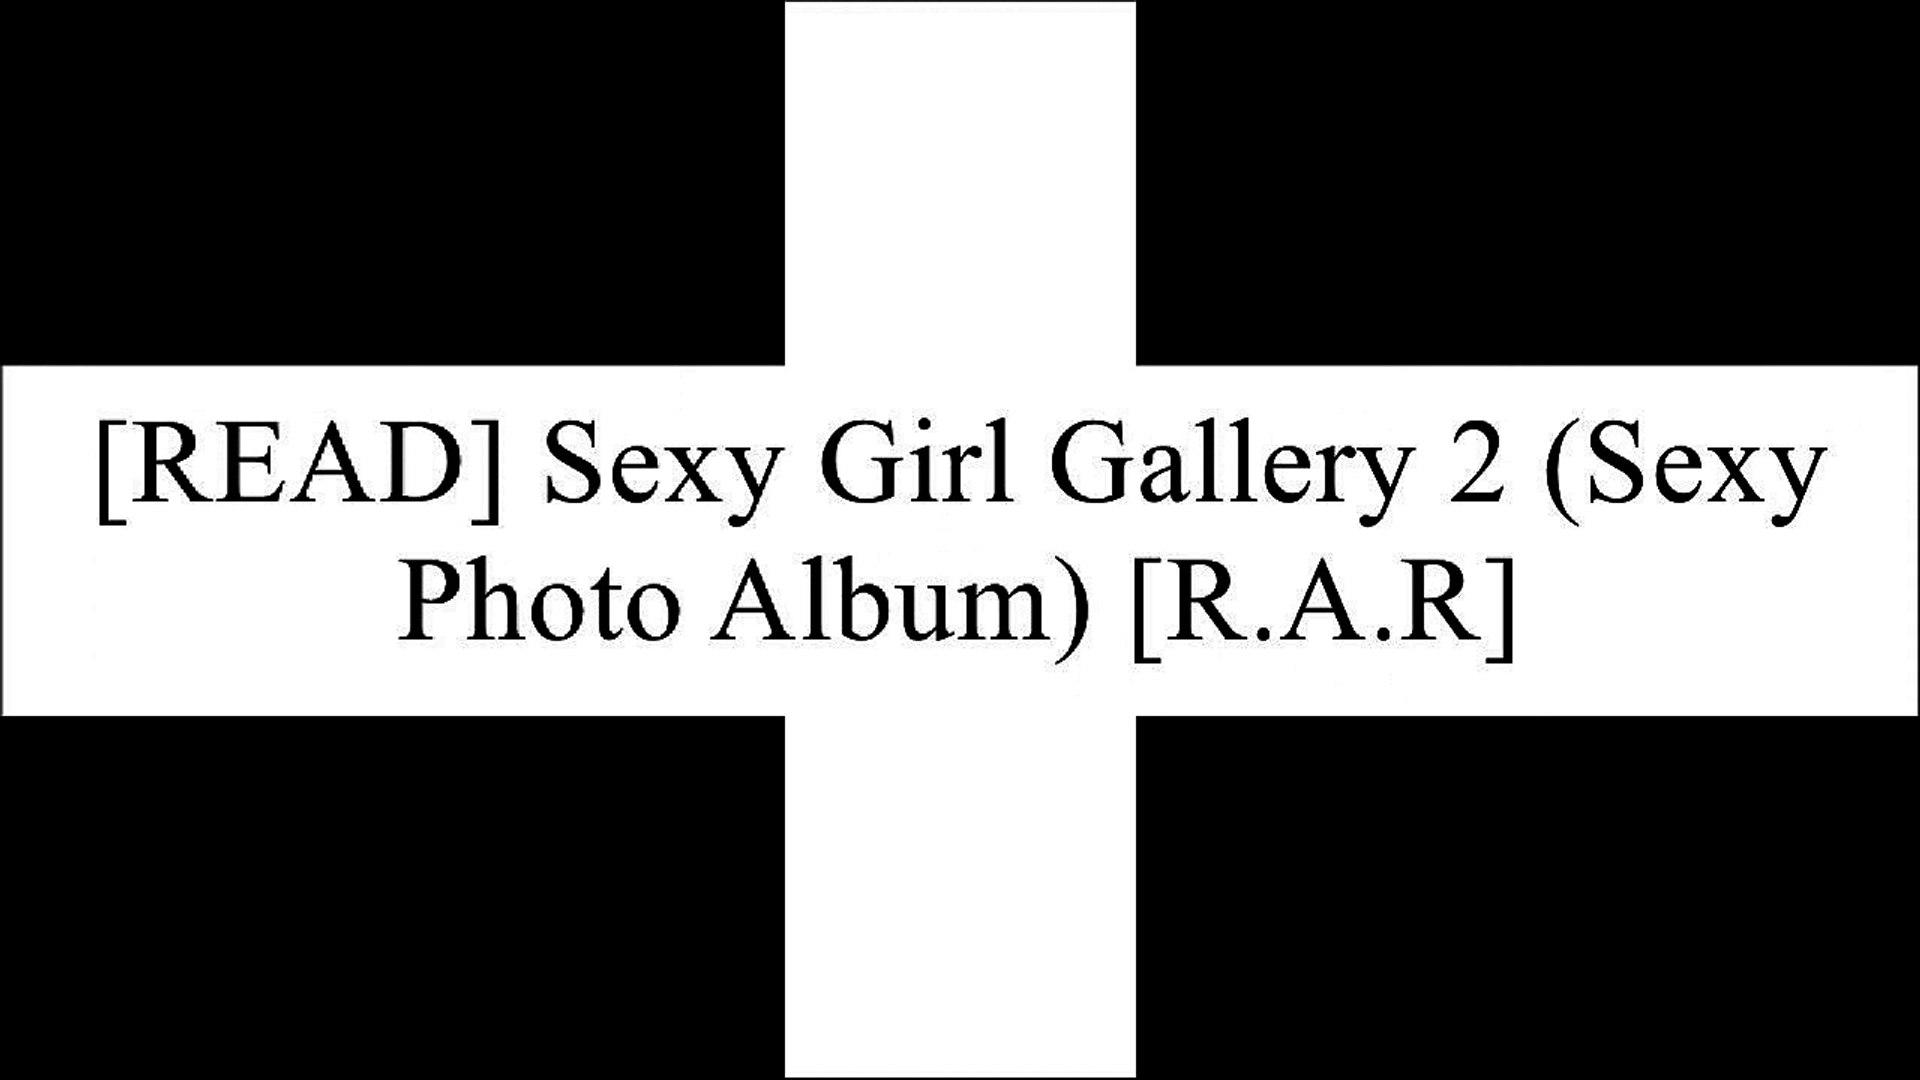 [qhCZZ.Ebook] Sexy Girl Gallery 2 (Sexy Photo Album) by Peter Brown D.O.C